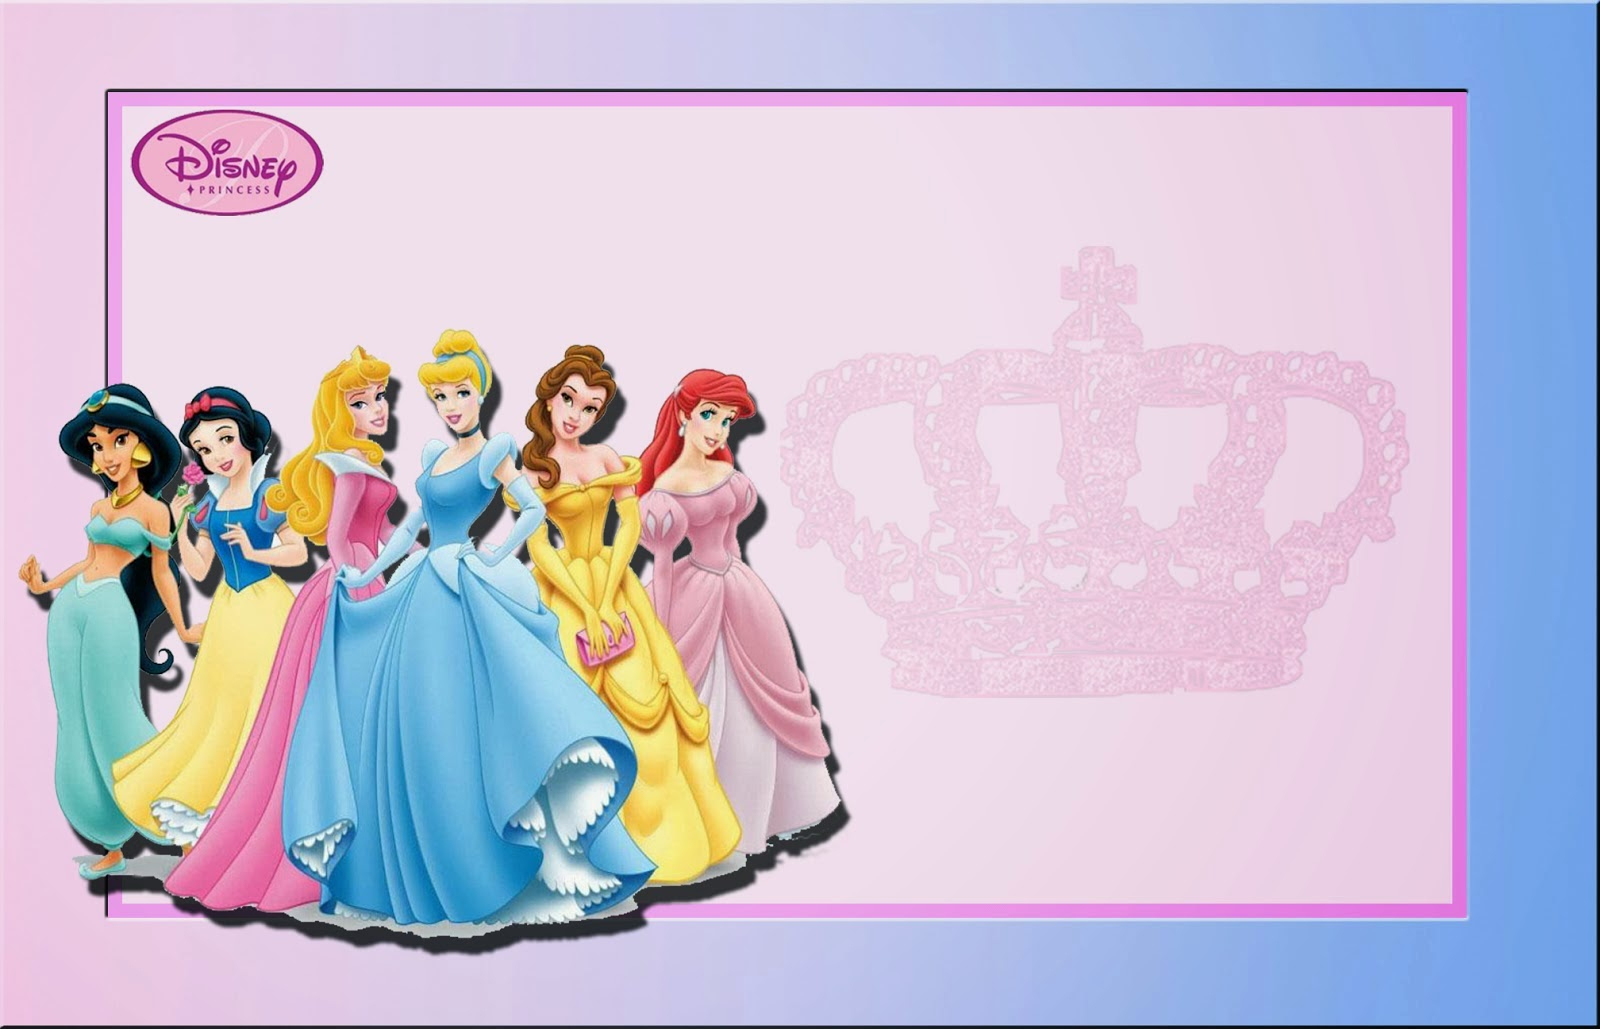 Disney Princess: Free Printable Invitations Or Photo Frames.   Oh My - Disney Princess Free Printable Invitations